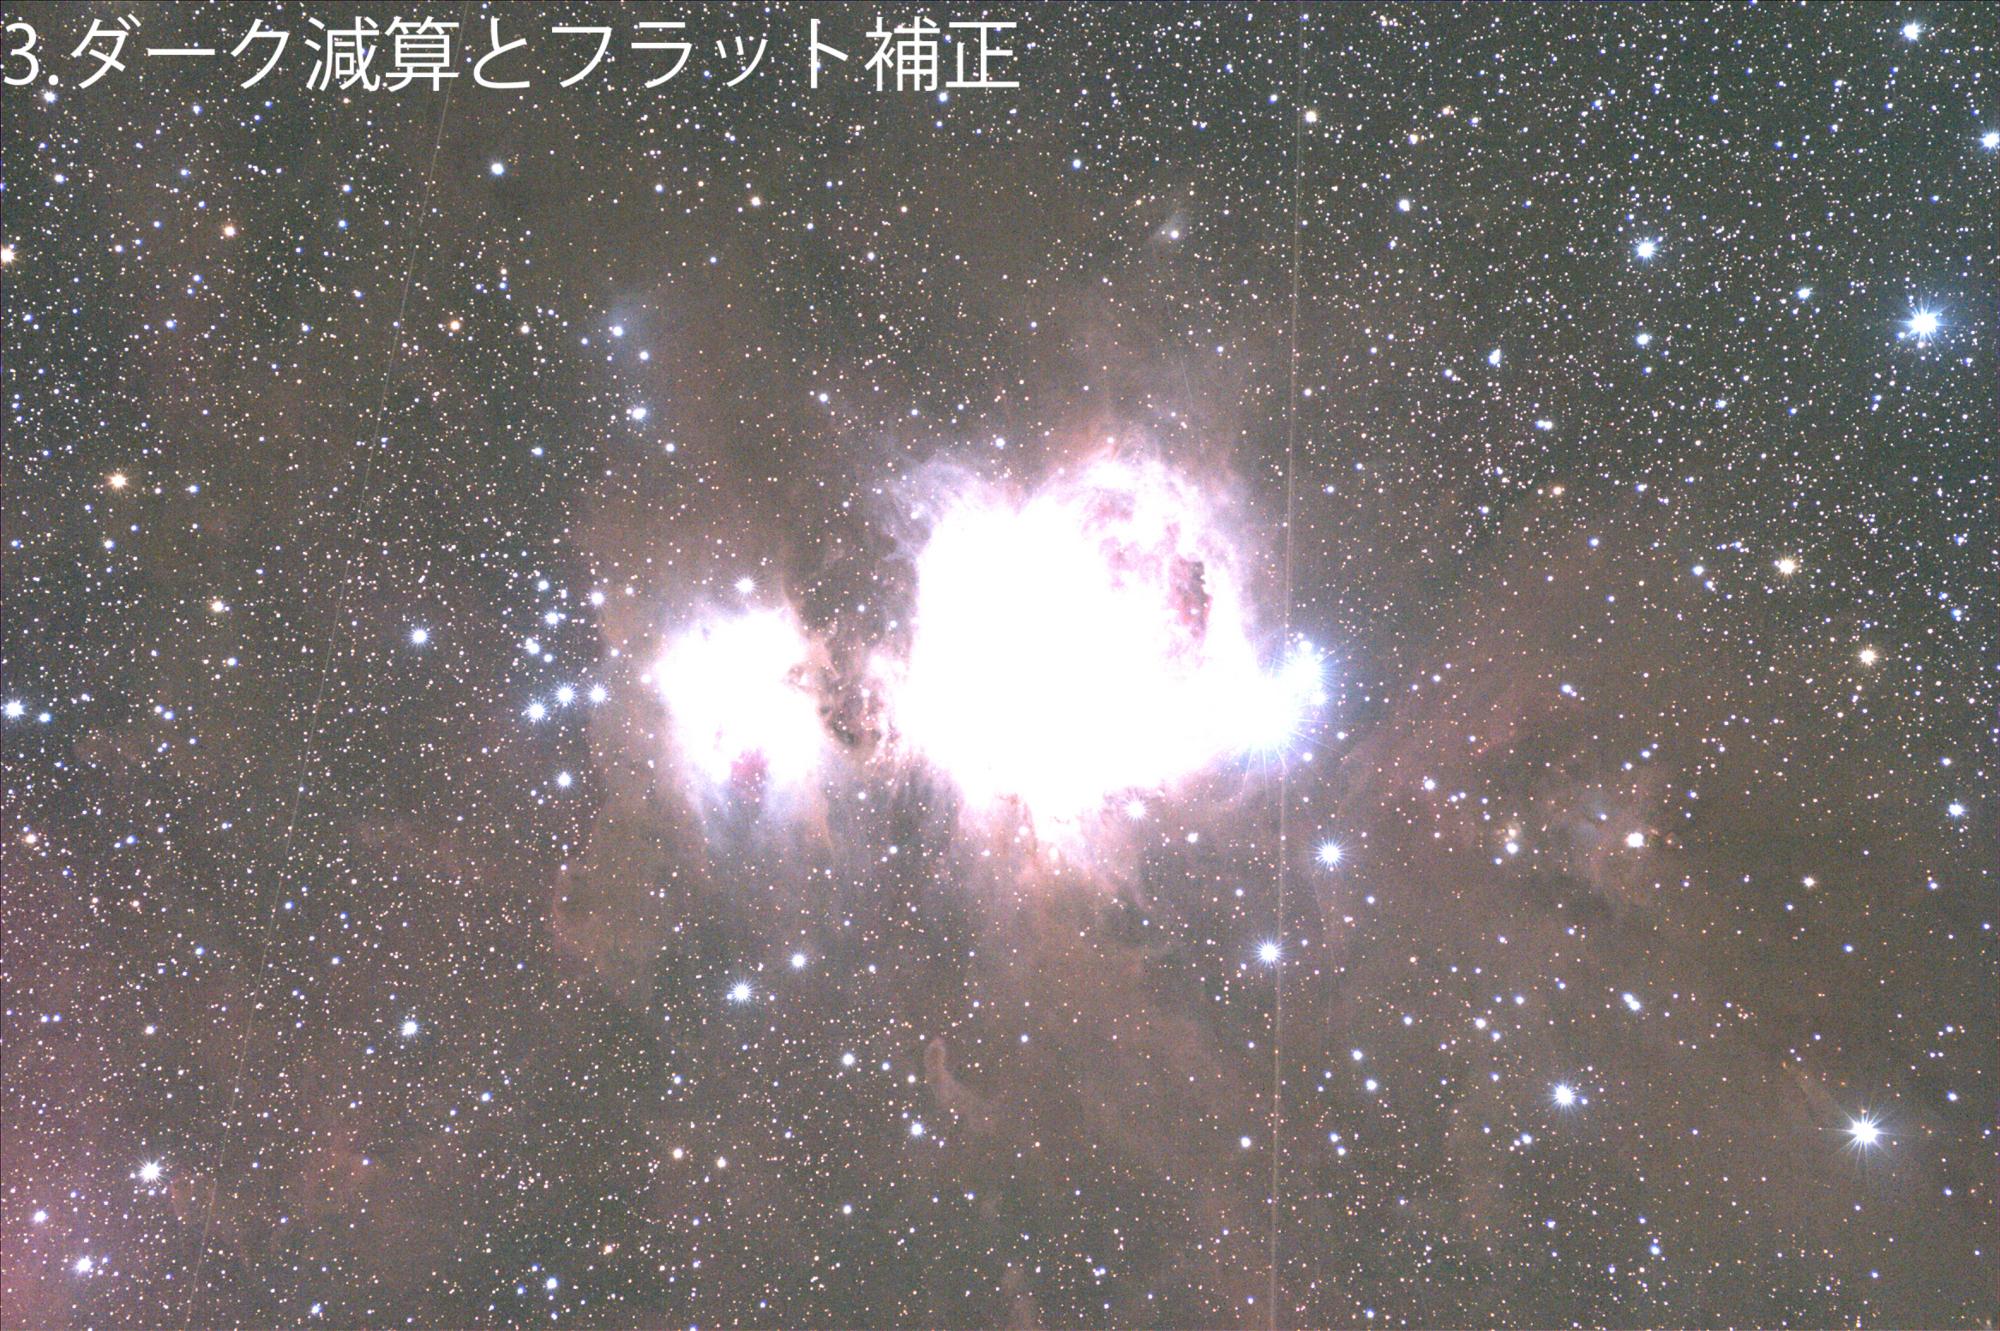 f:id:snct-astro:20171210224958j:plain